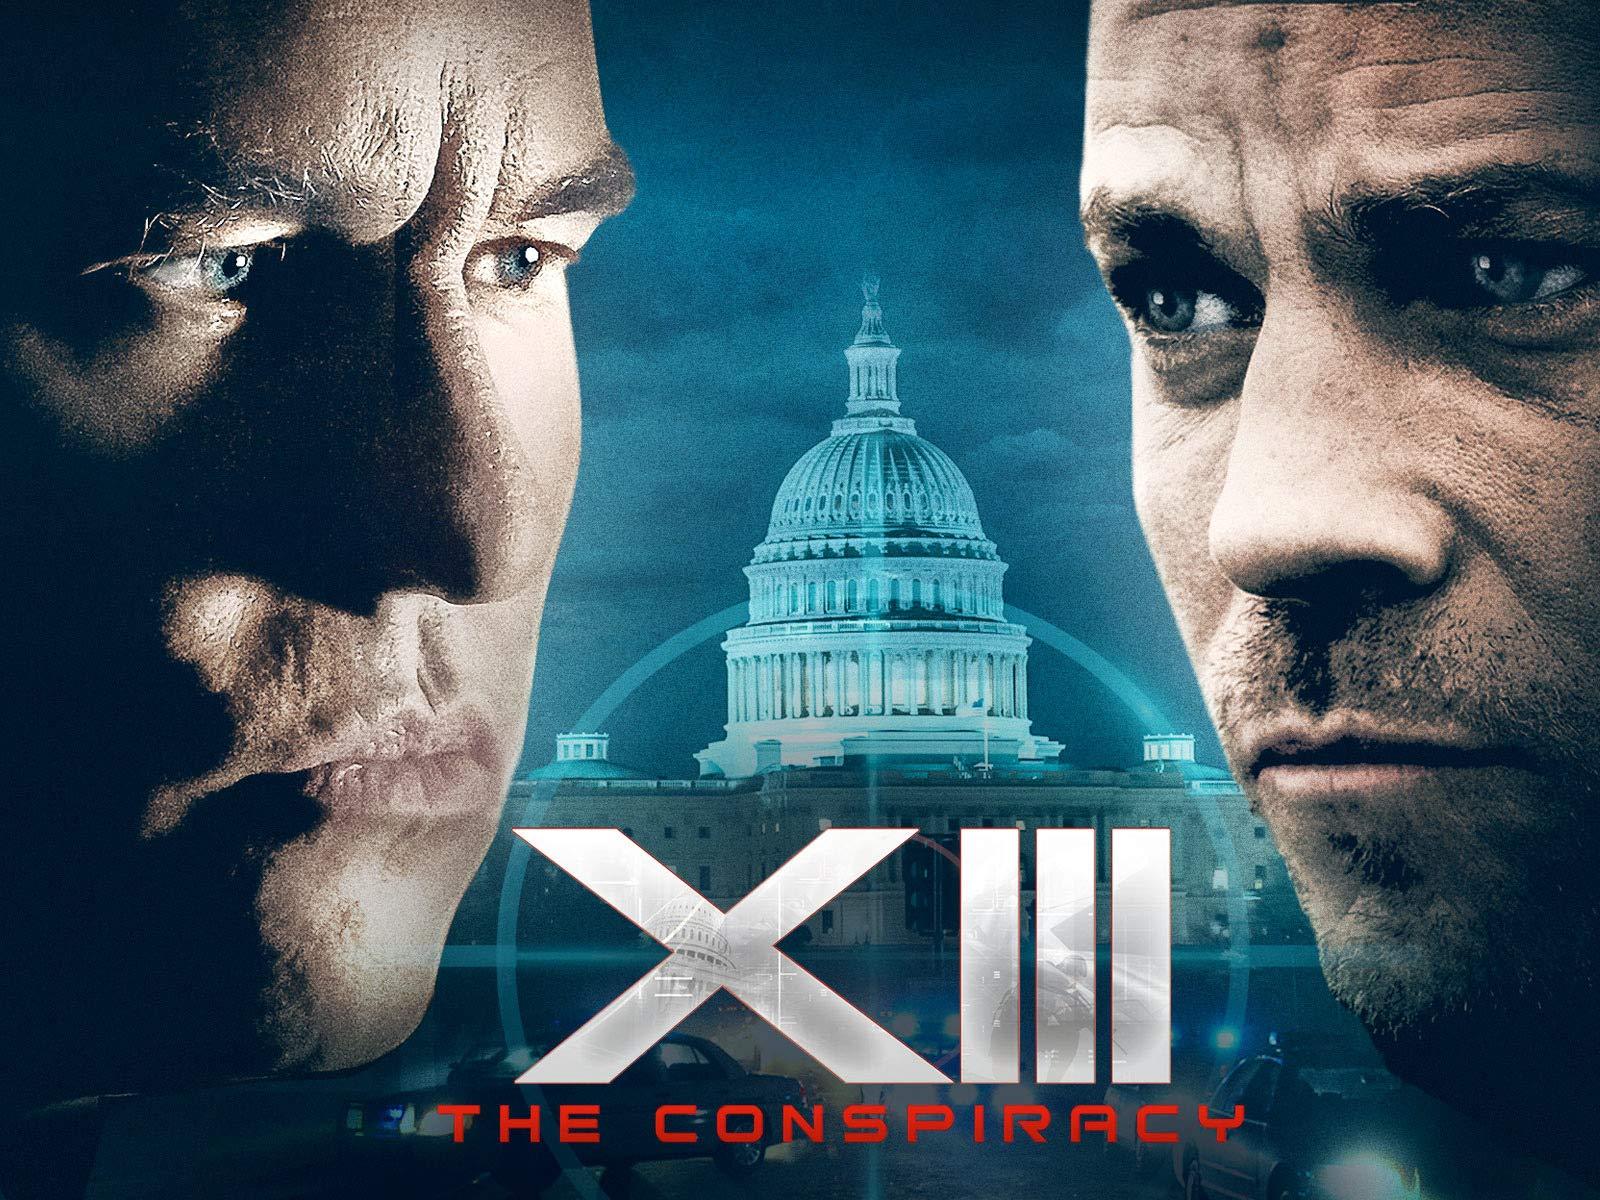 XIII: The Conspiracy - Season 1